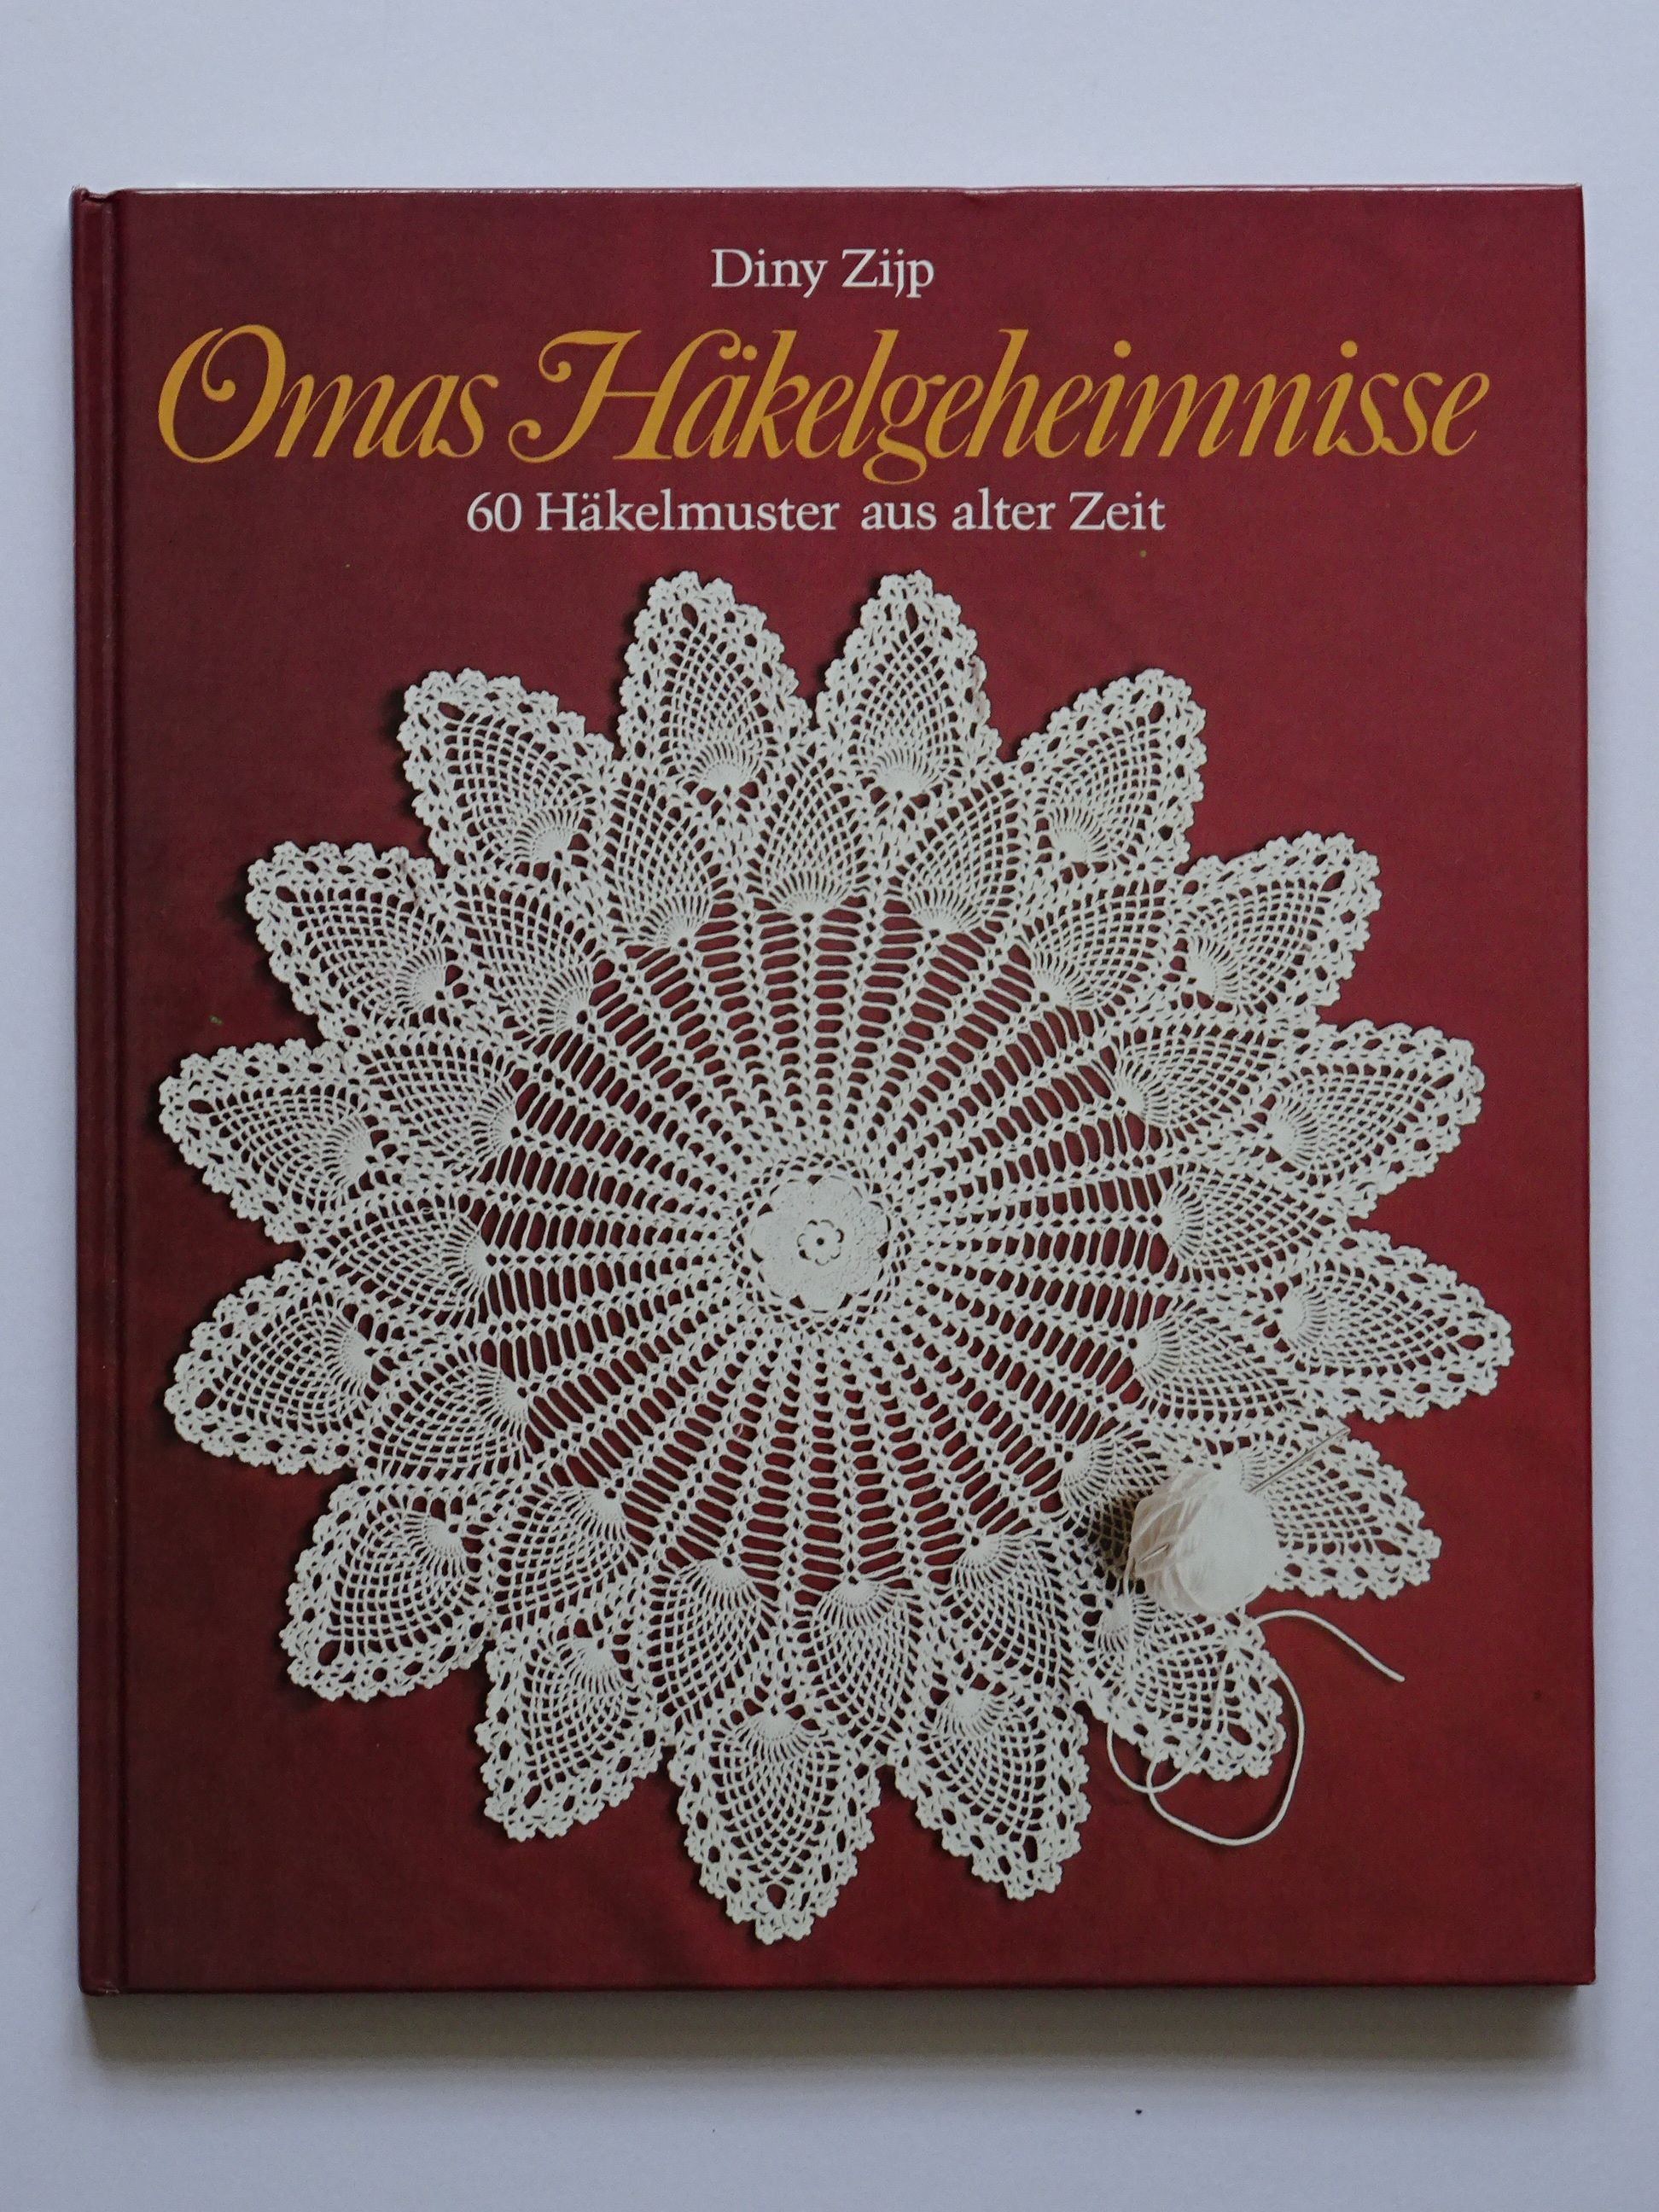 Zijp, Diny – Omas Häkelgeheimnisse 60 Häkelmuster aus alter Zeit